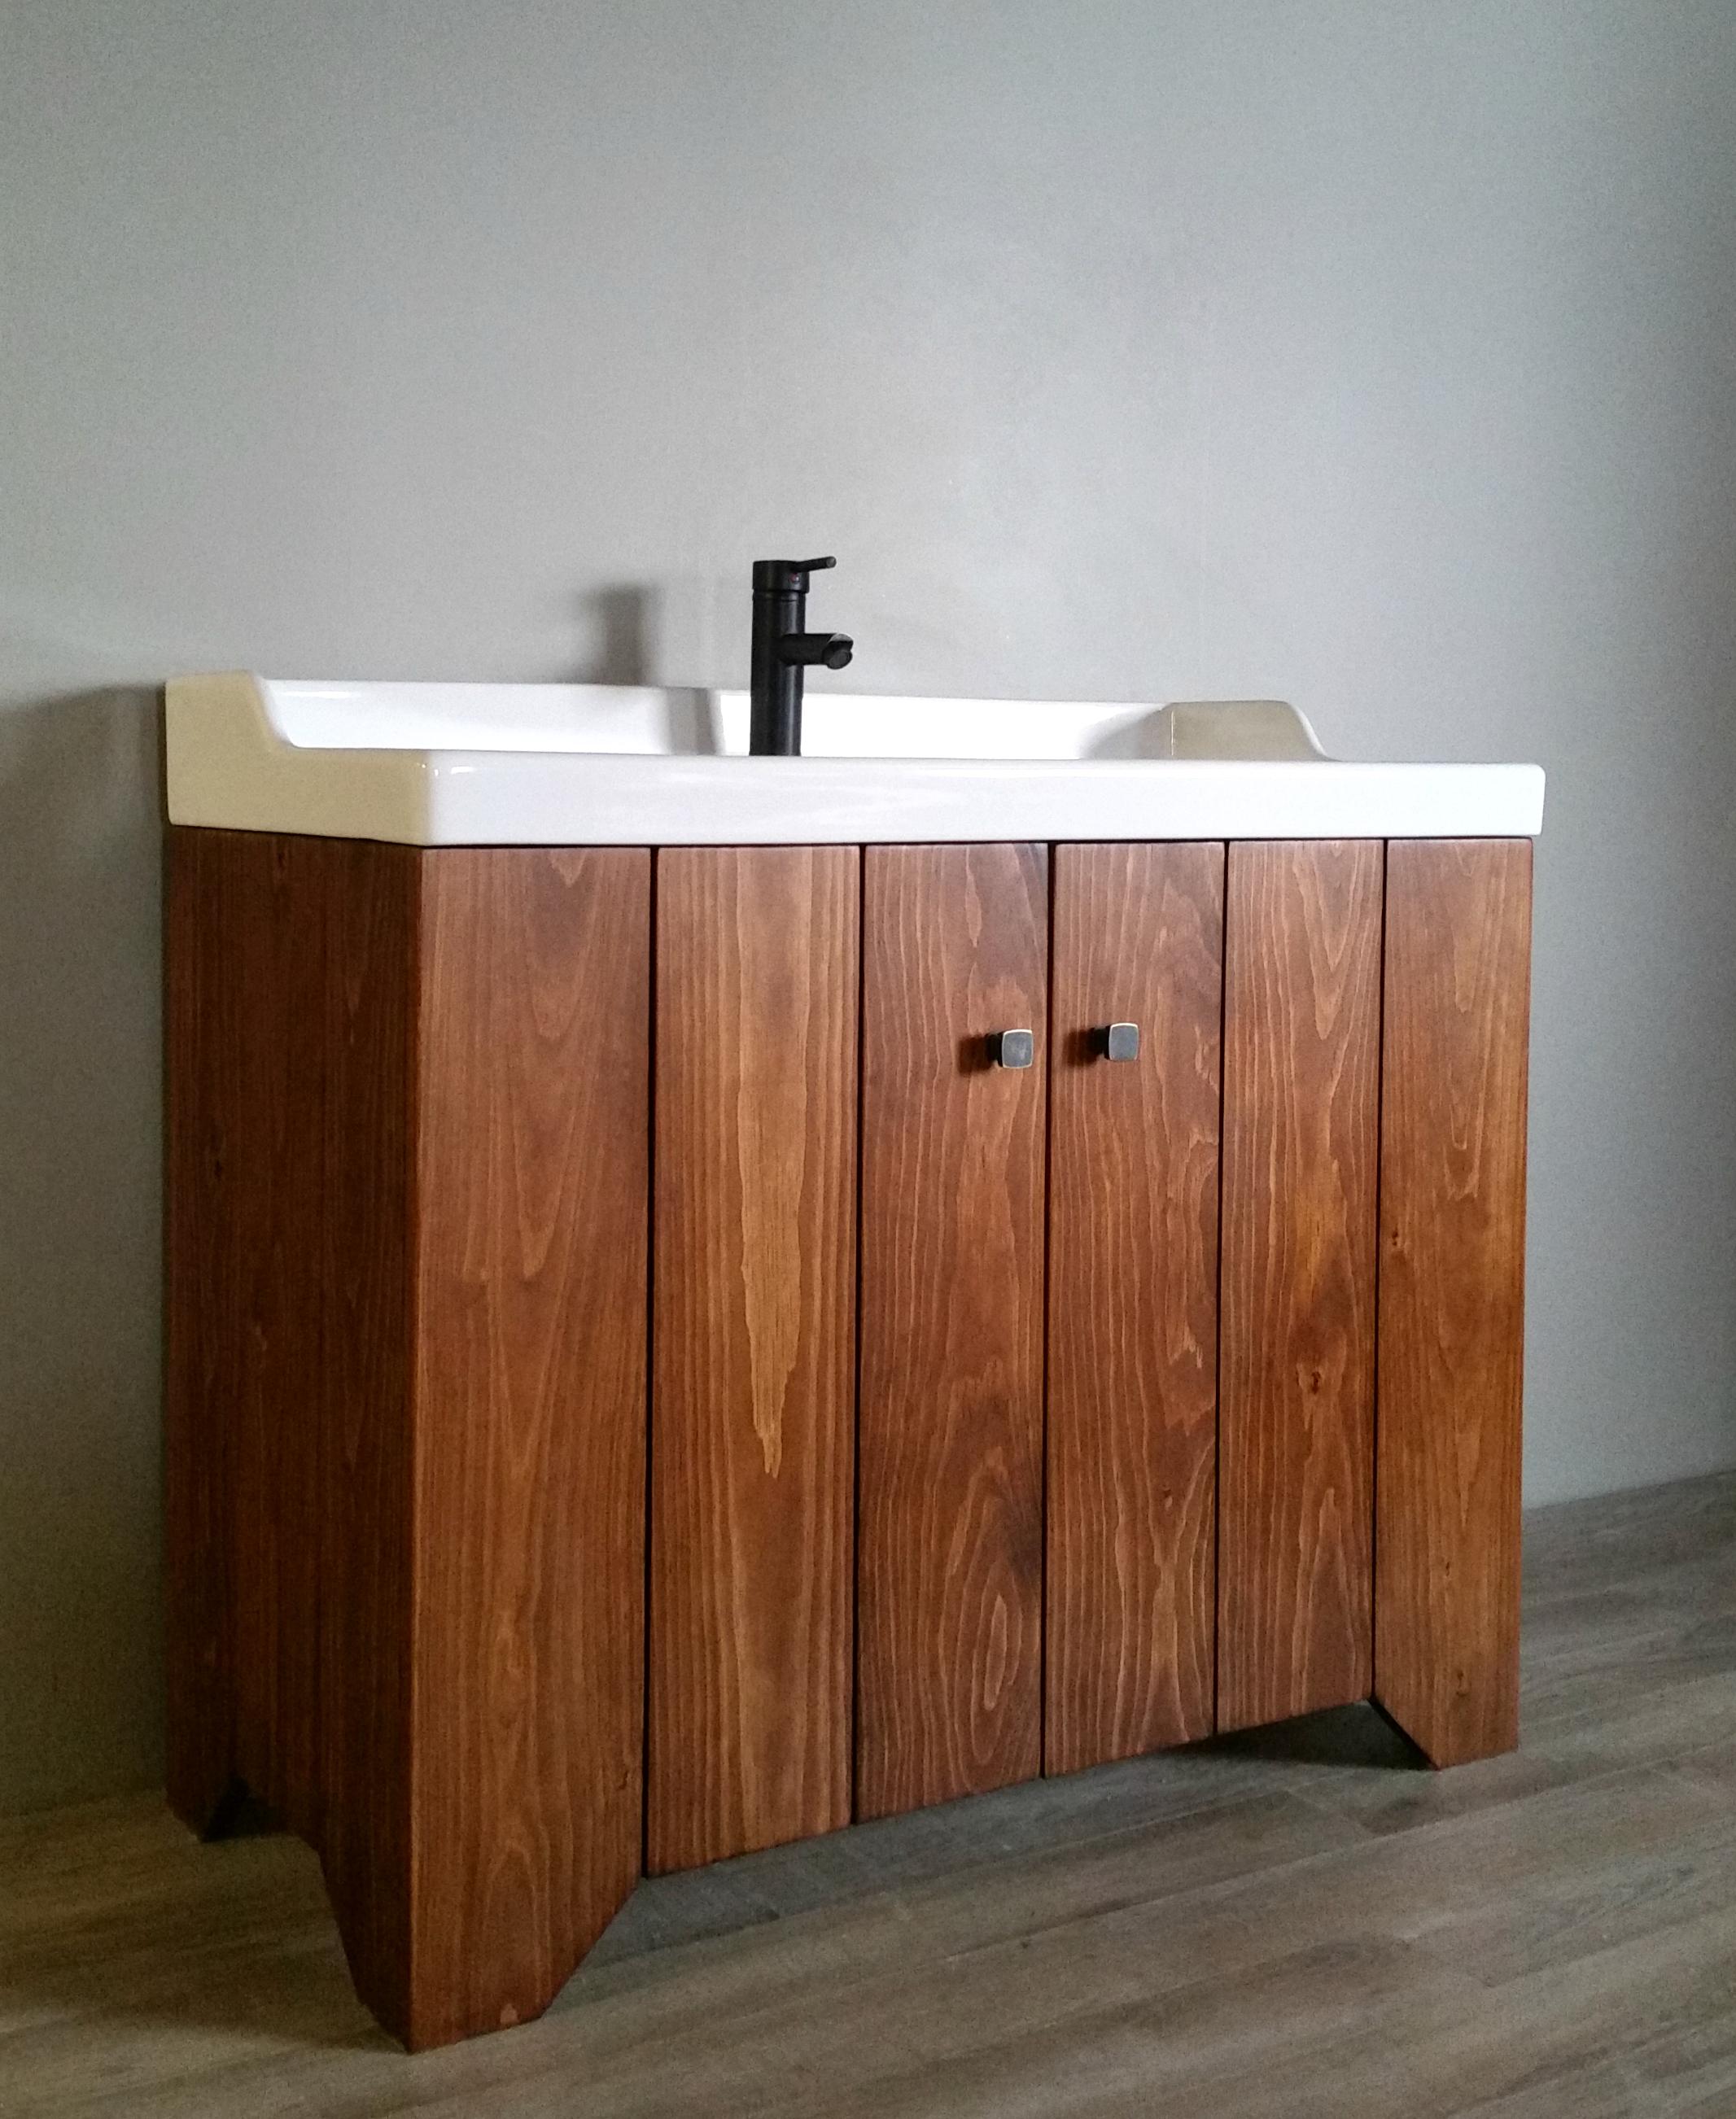 Modern Farmhouse Bathroom Vanity Wooden Bathroom Vanity Wood Vanity Wood Bathroom Vanity